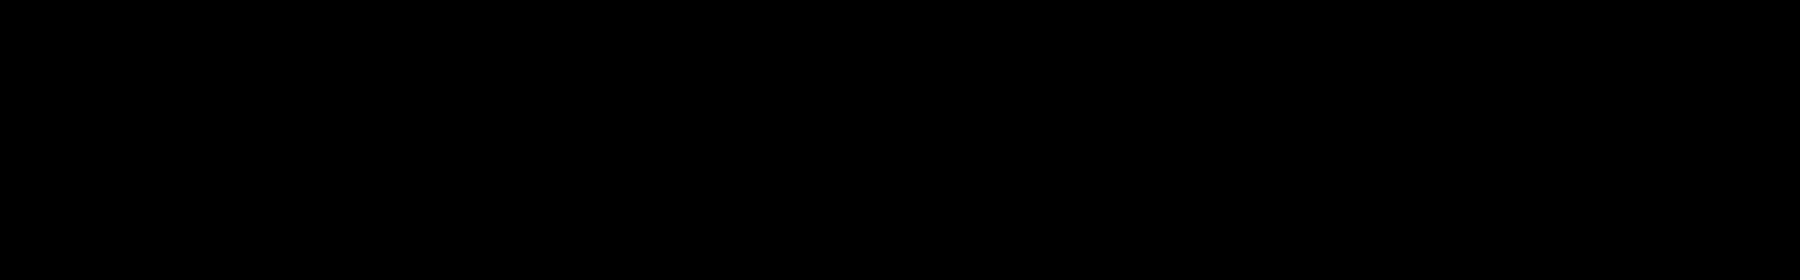 Poseidon 2 audio waveform